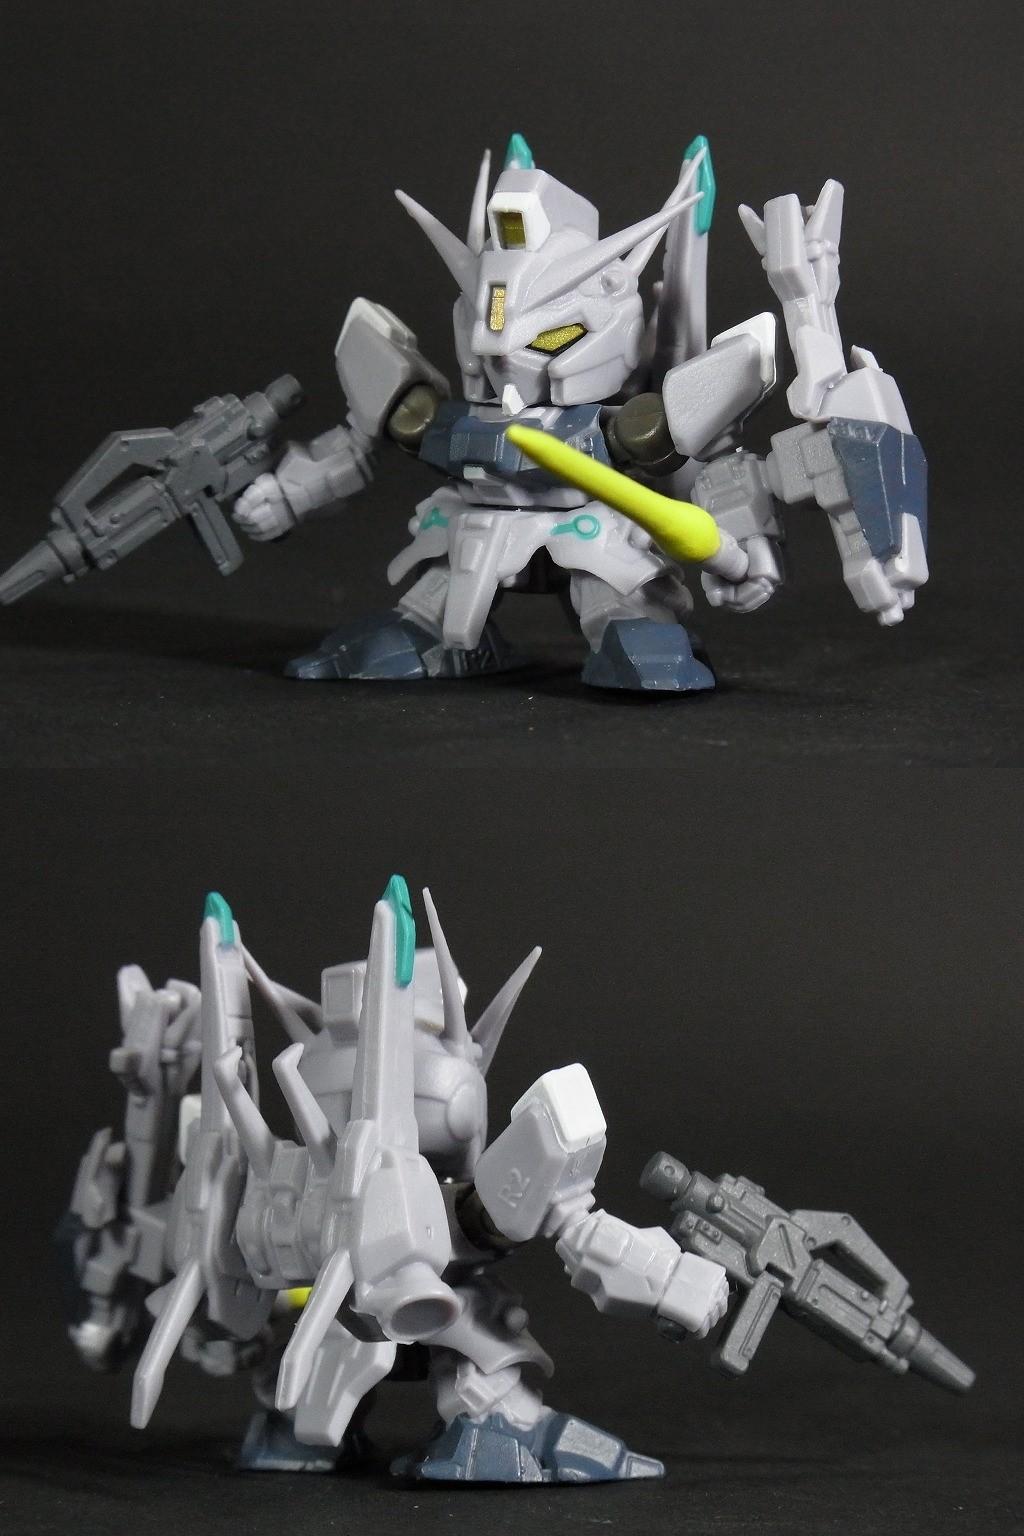 ARX-014